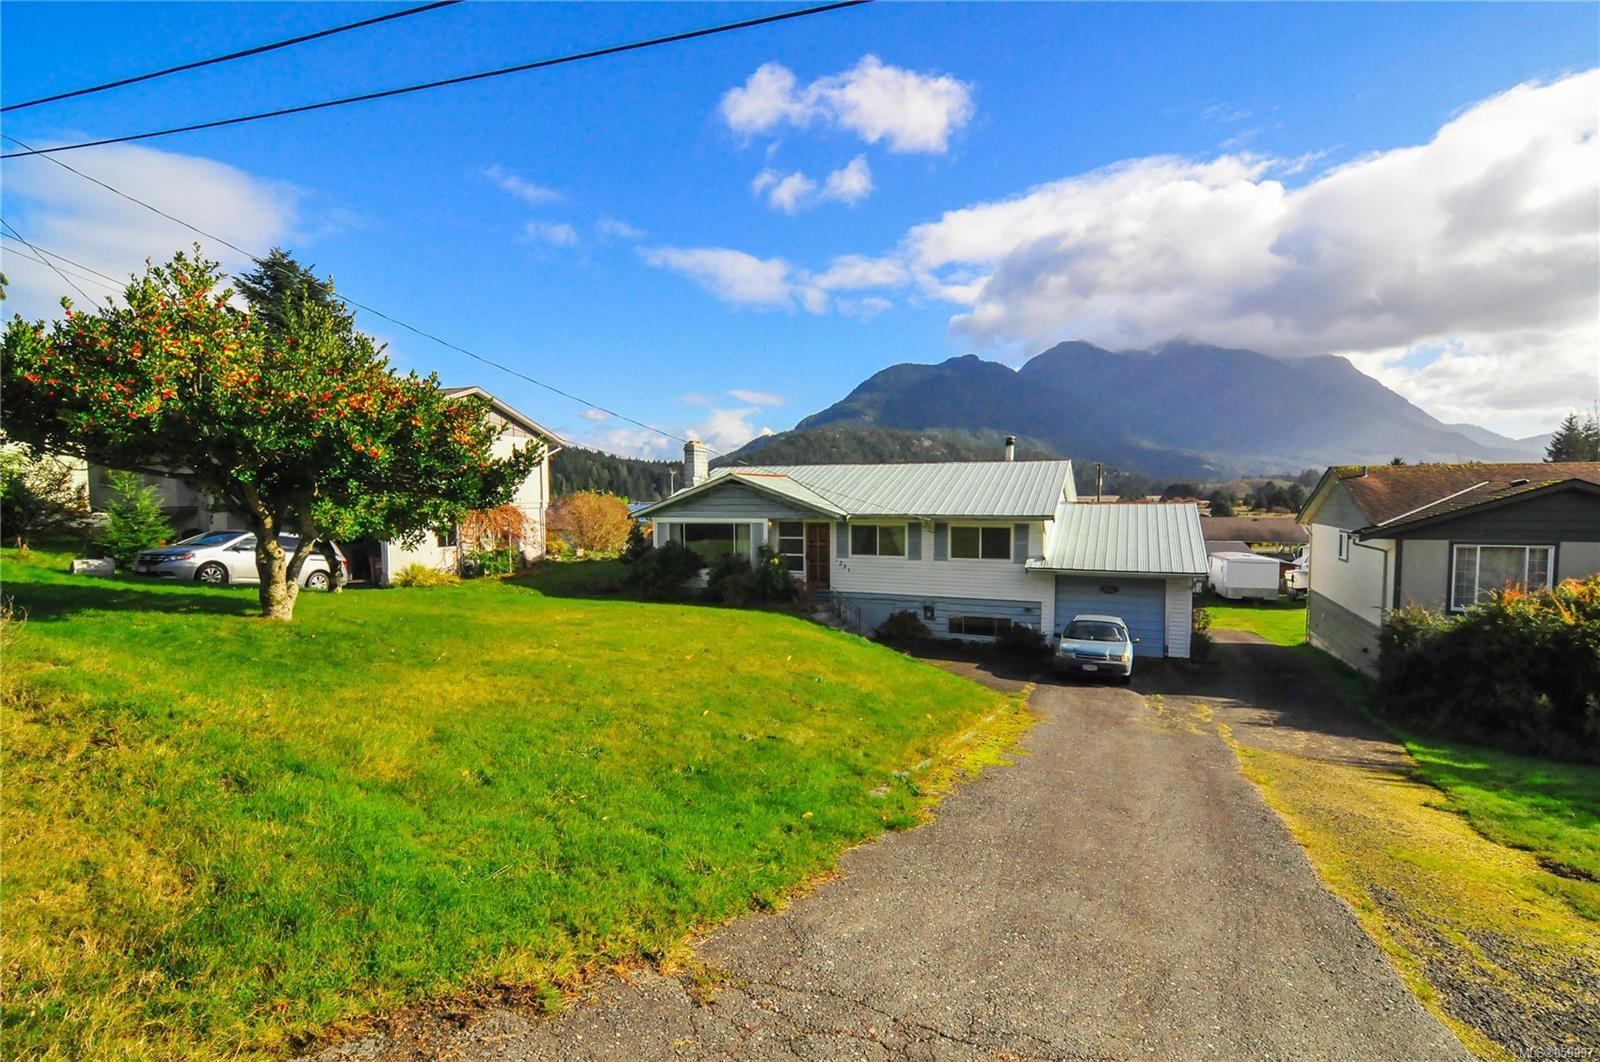 Main Photo: 231 Spar St in : NI Kelsey Bay/Sayward House for sale (North Island)  : MLS®# 859997